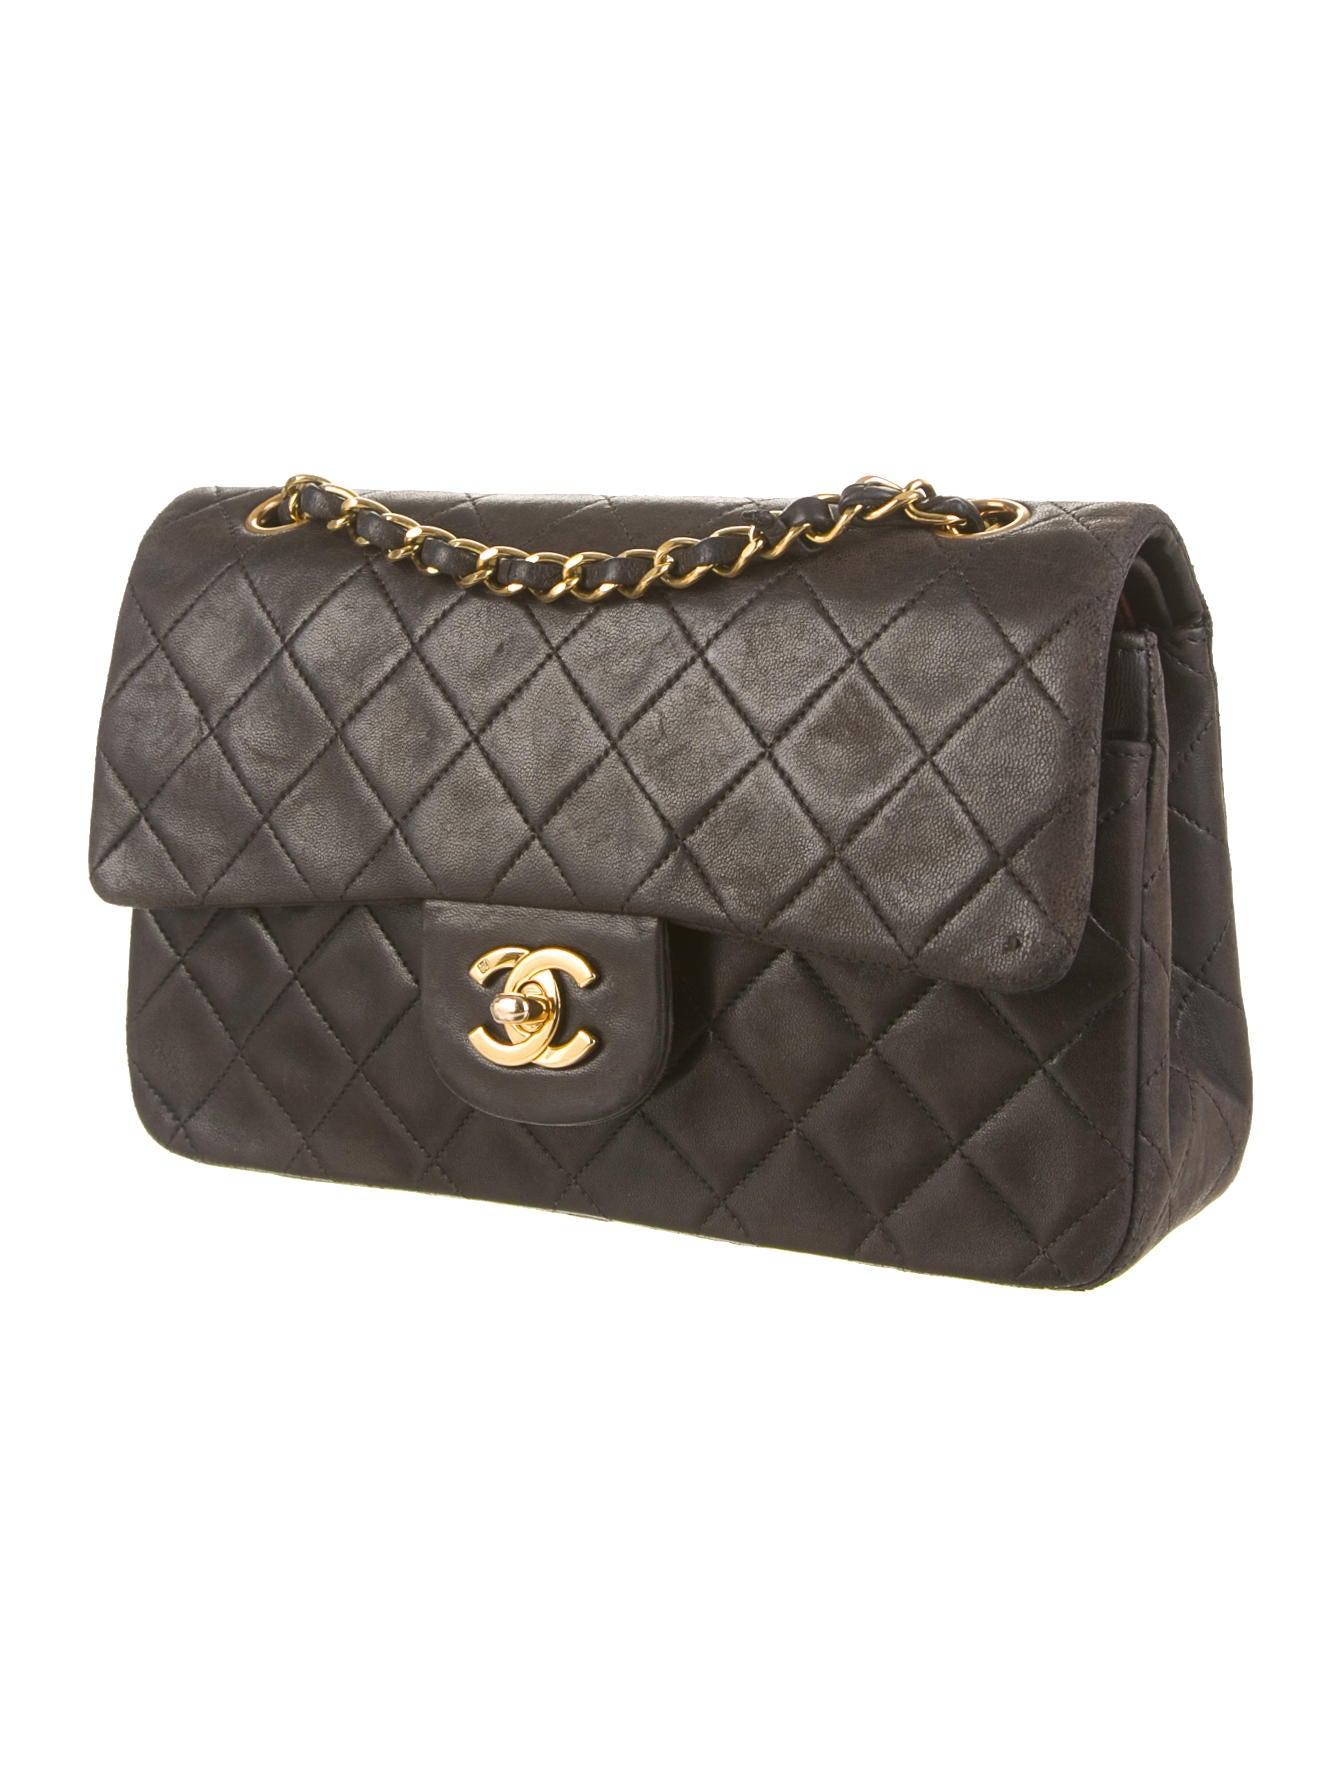 1439655e9f50 Chanel Vintage Classic Small Double Flap Bag - Handbags - CHA64123   The  RealReal